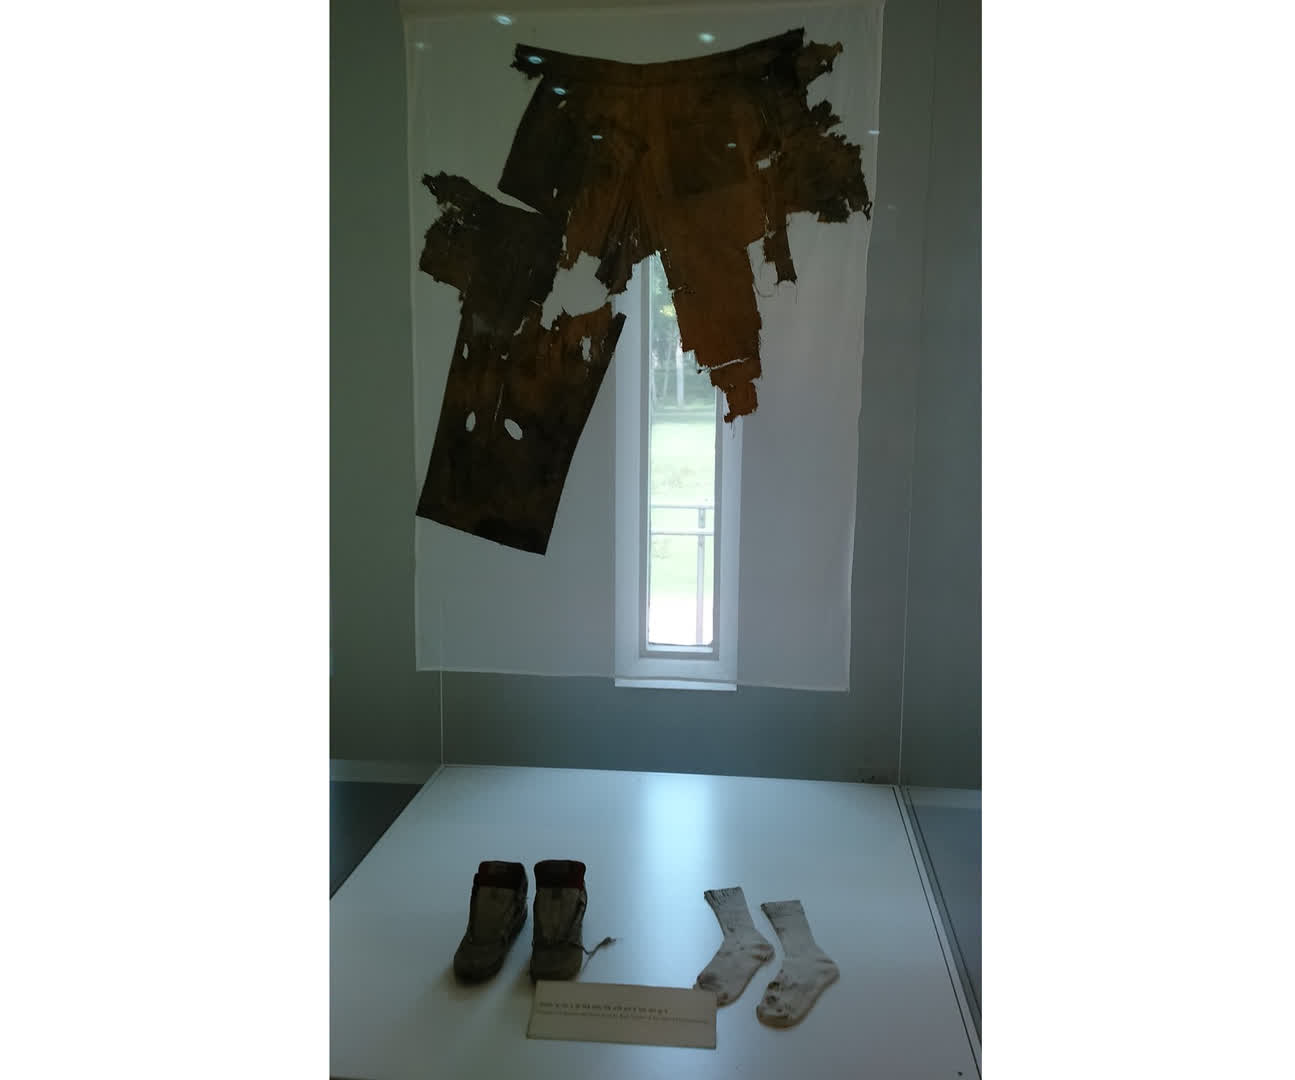 Remains of clothing worn by Rajiv Gandhi during his assassination | Indira Gandhi Memorial Museum, New Delhi